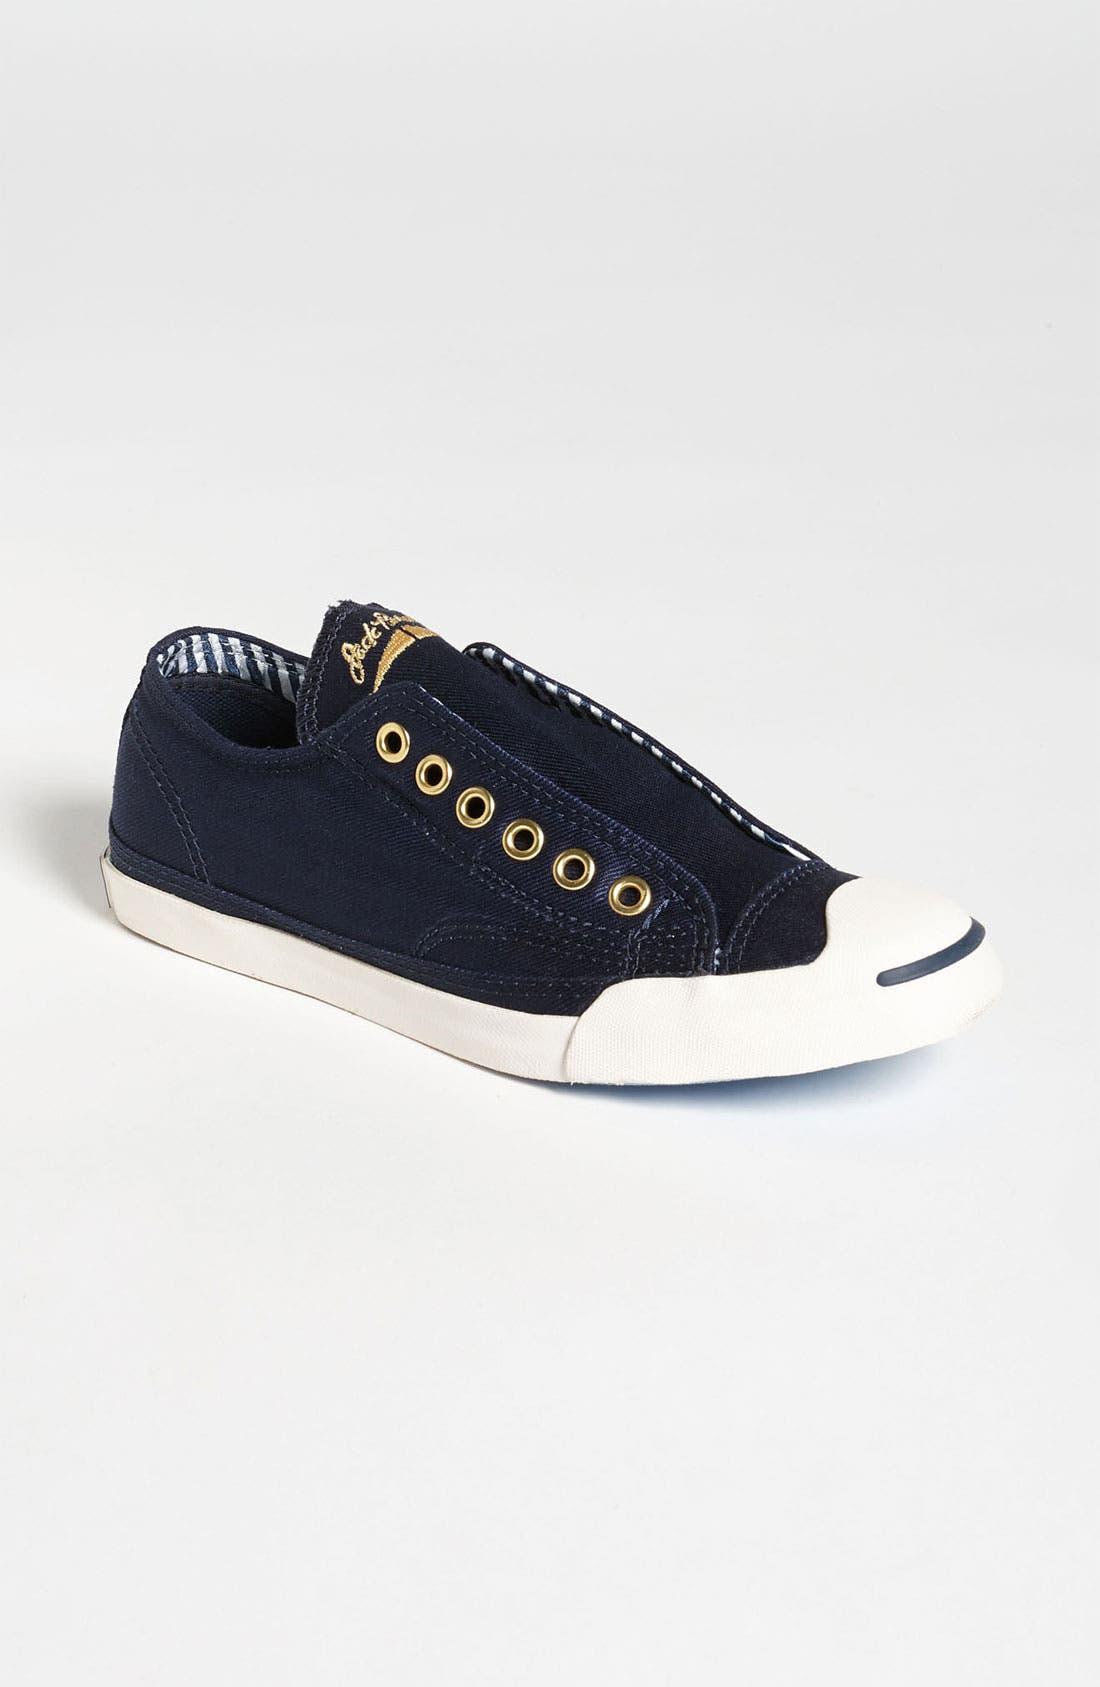 Main Image - Converse 'Jack Purcell' Twill Sneaker (Women)